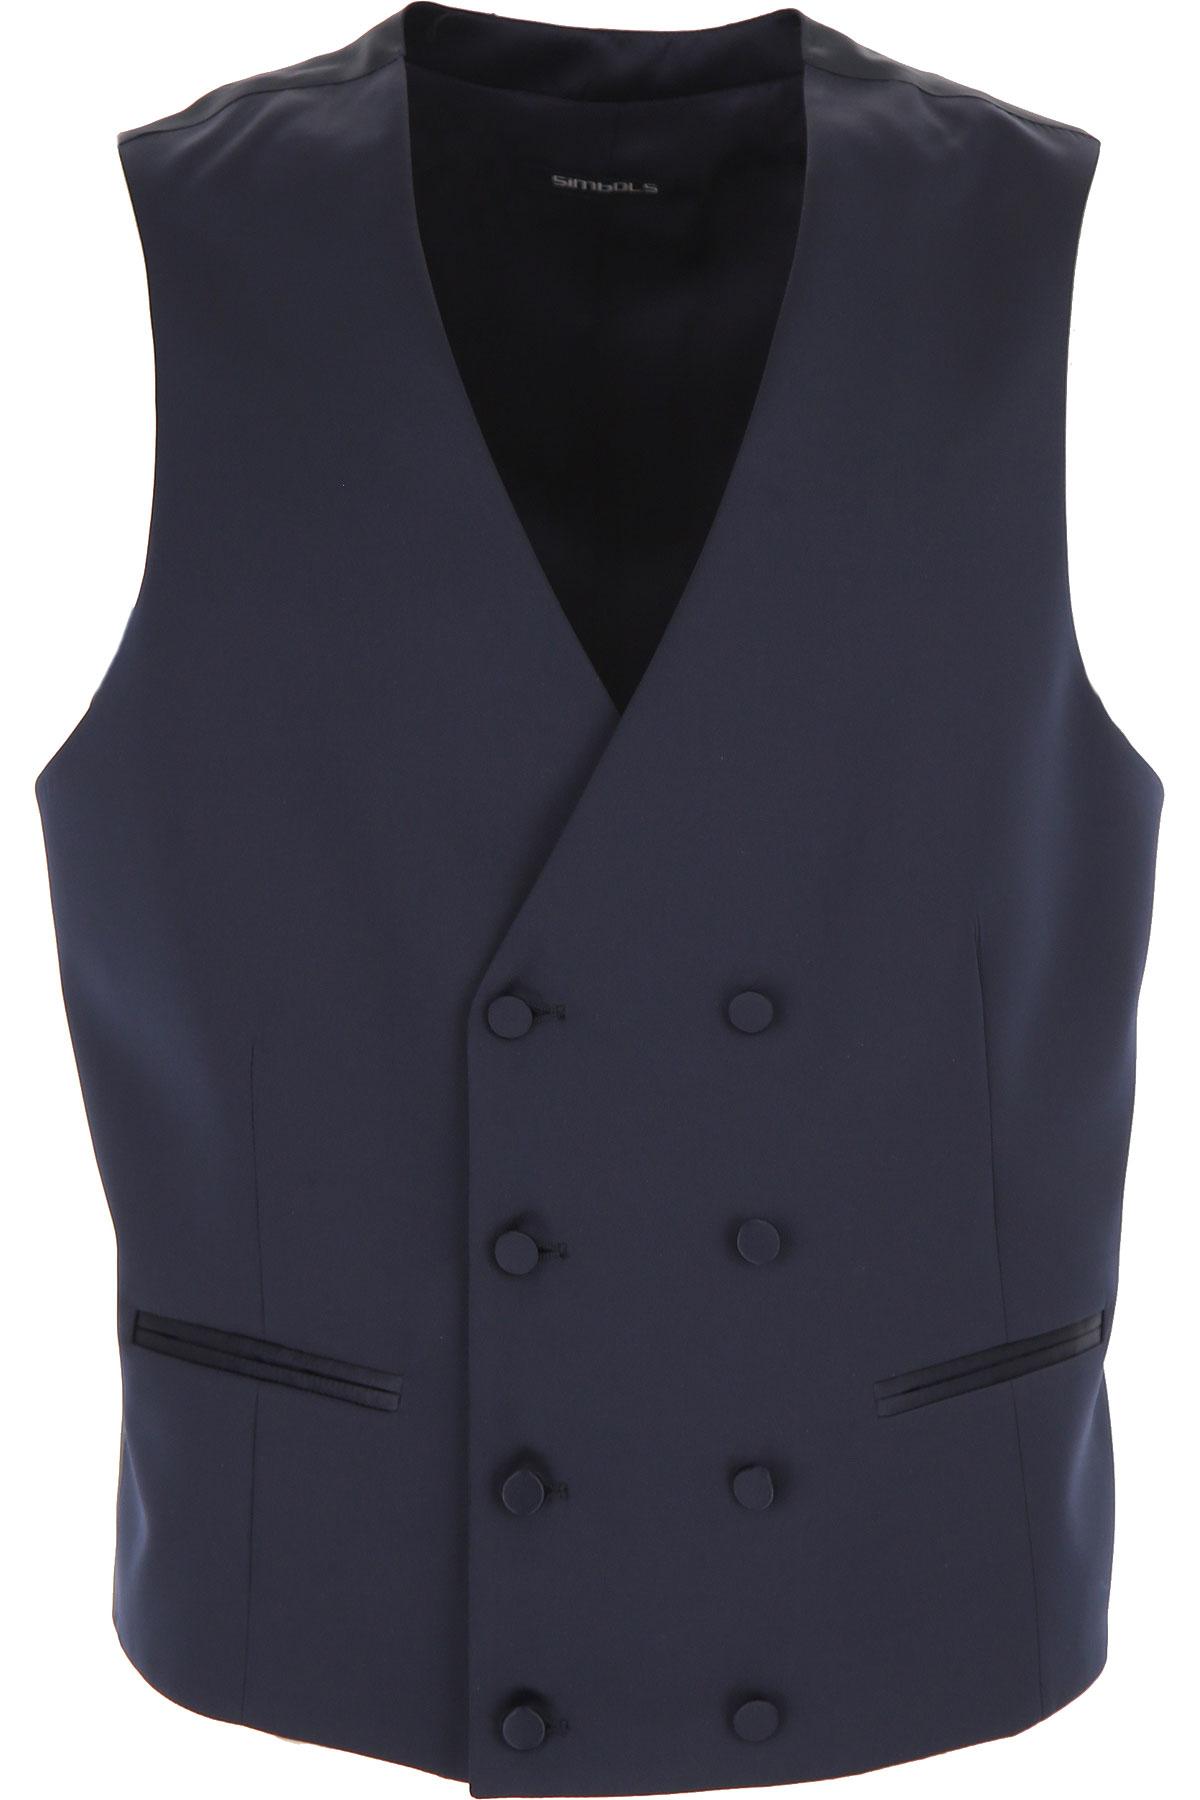 Simbols Mens Clothing, Dark Navy Blue, polyester, 2019, L M S XL